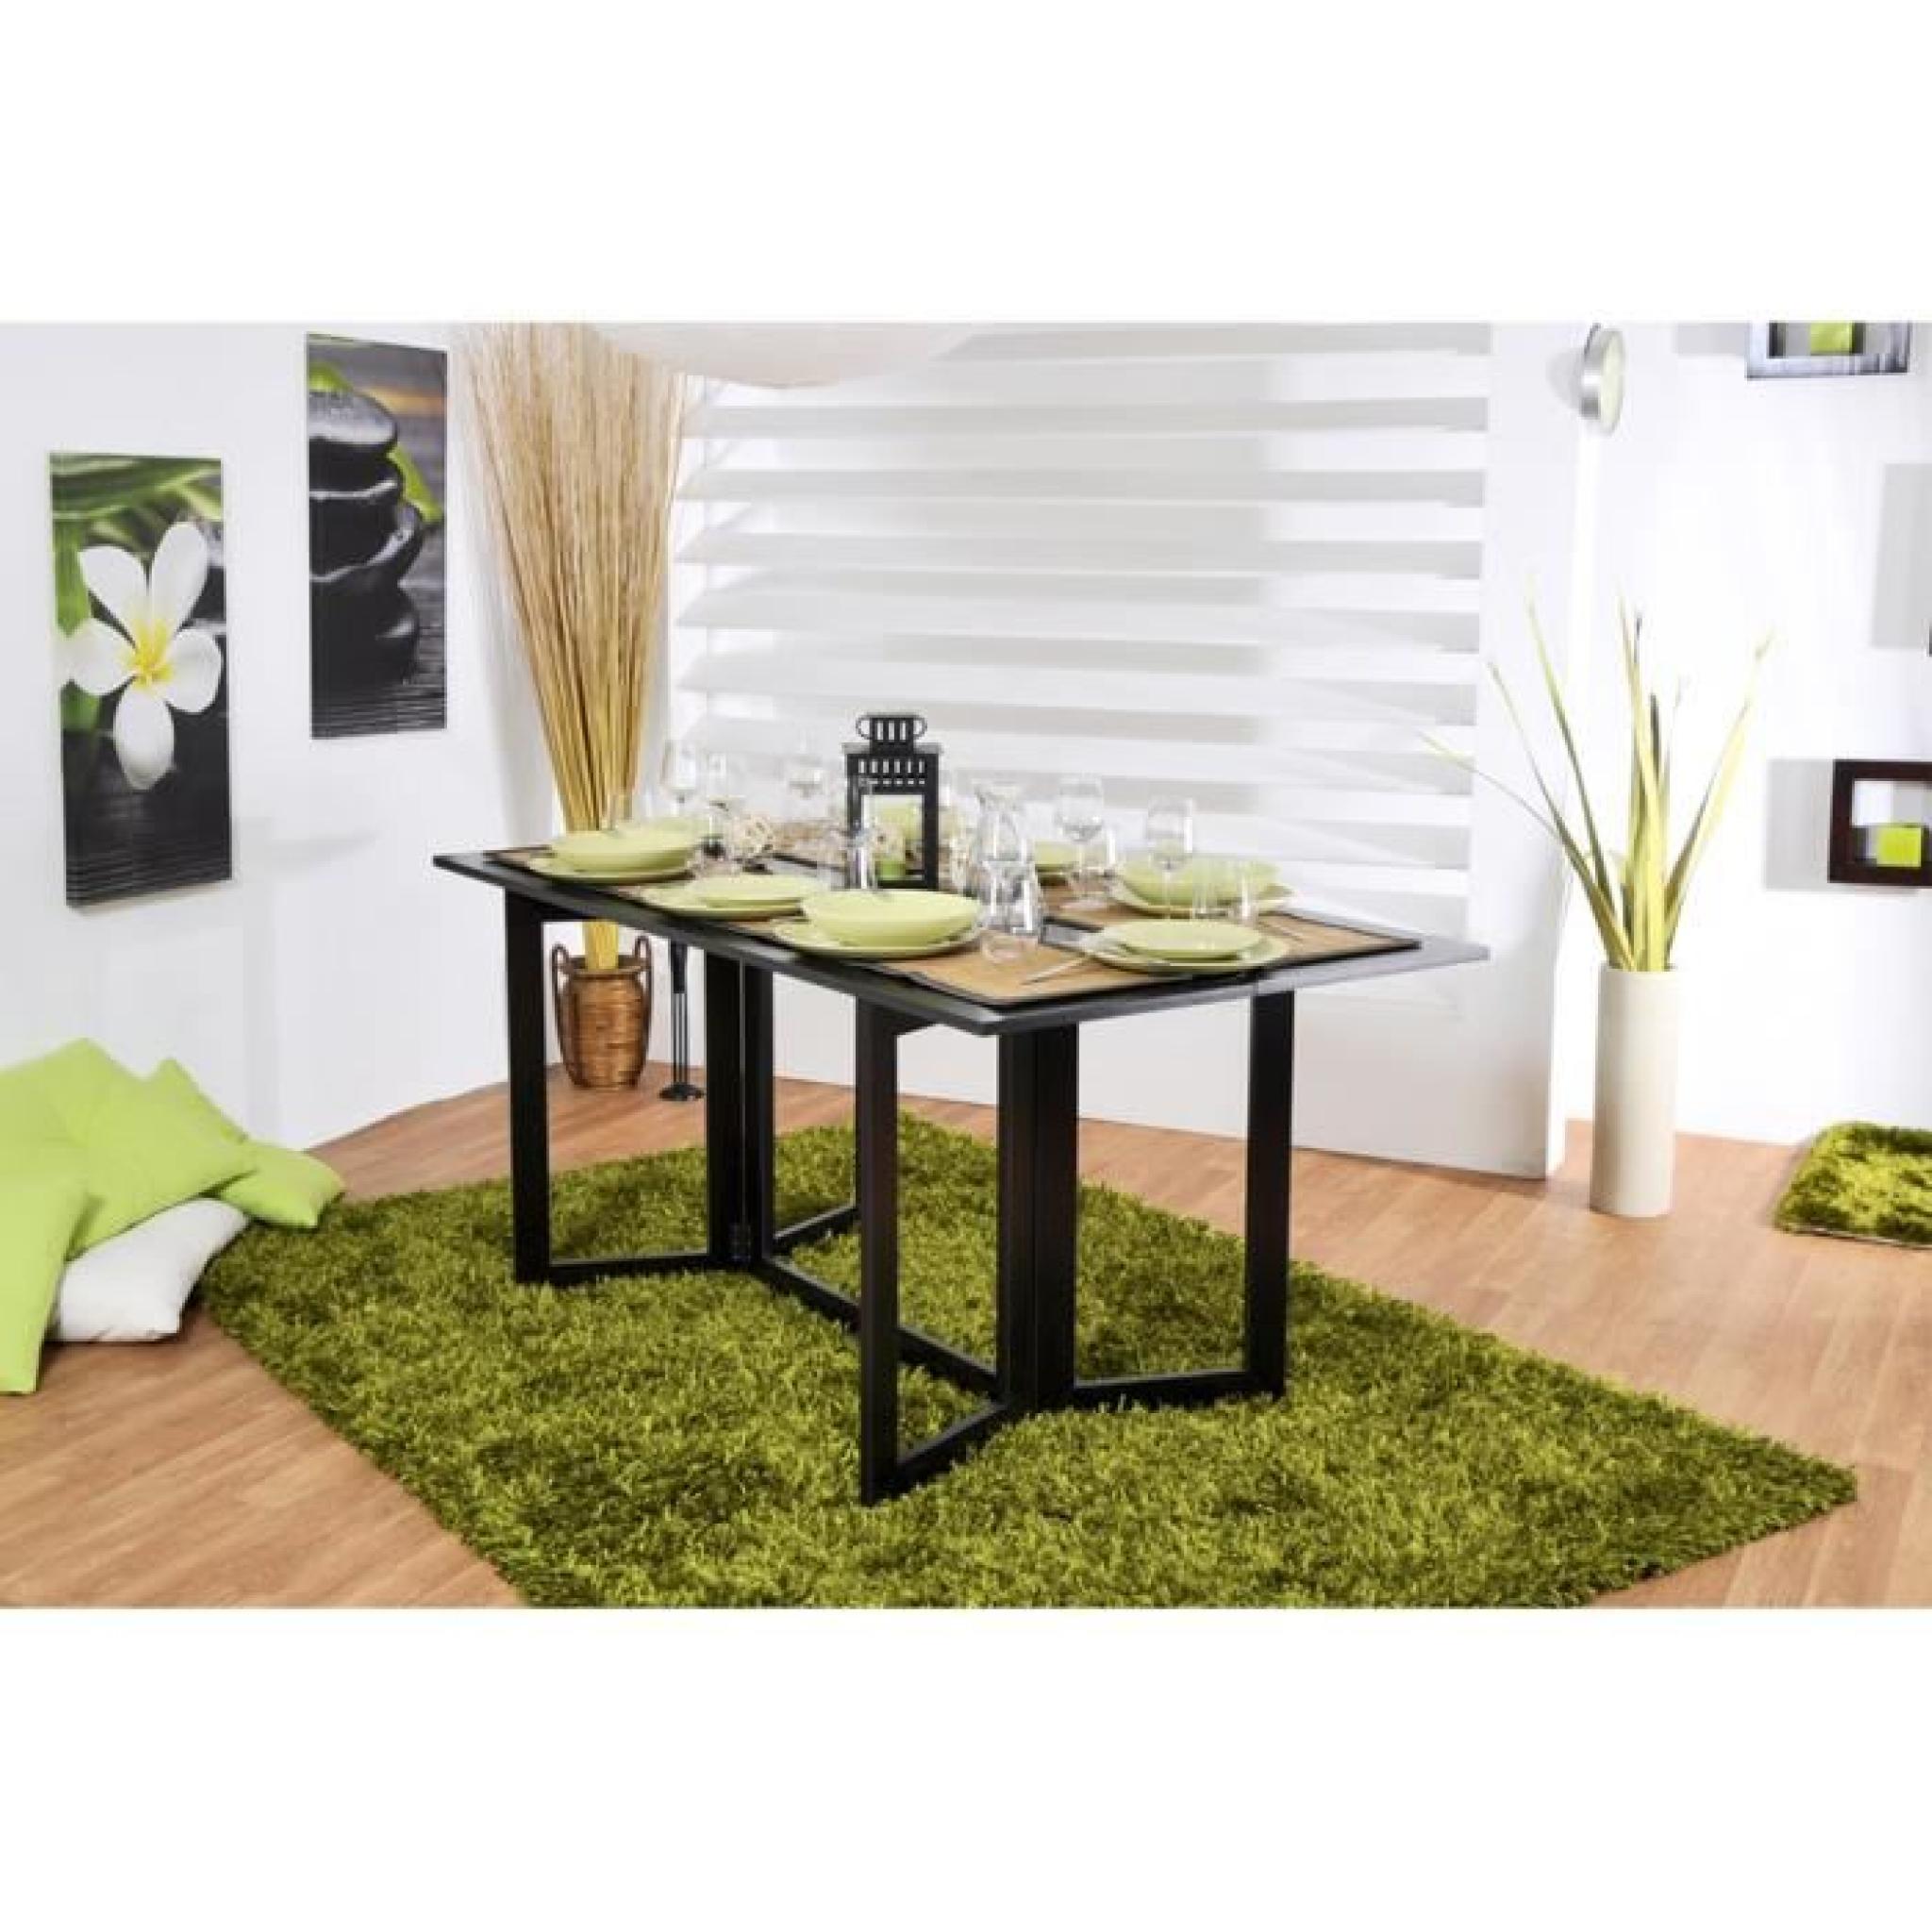 table console rabattable weng espa achat vente console. Black Bedroom Furniture Sets. Home Design Ideas